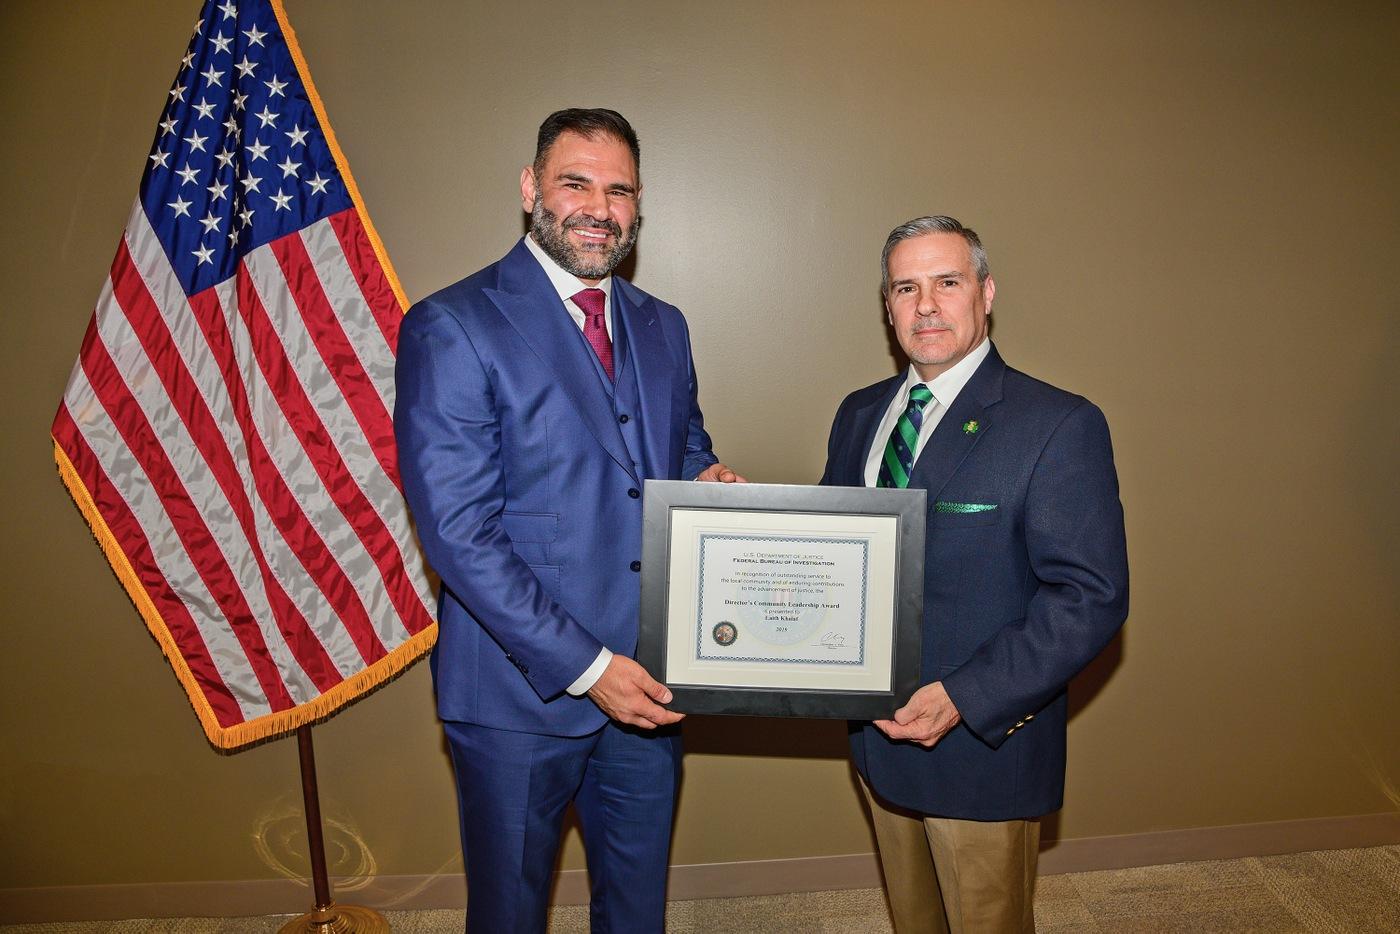 Special Agent in Charge Chris Hoffman of FBI Cincinnati presents the FBI Director's Community Leadership Award to Columbus businessman Laith Khalaf.